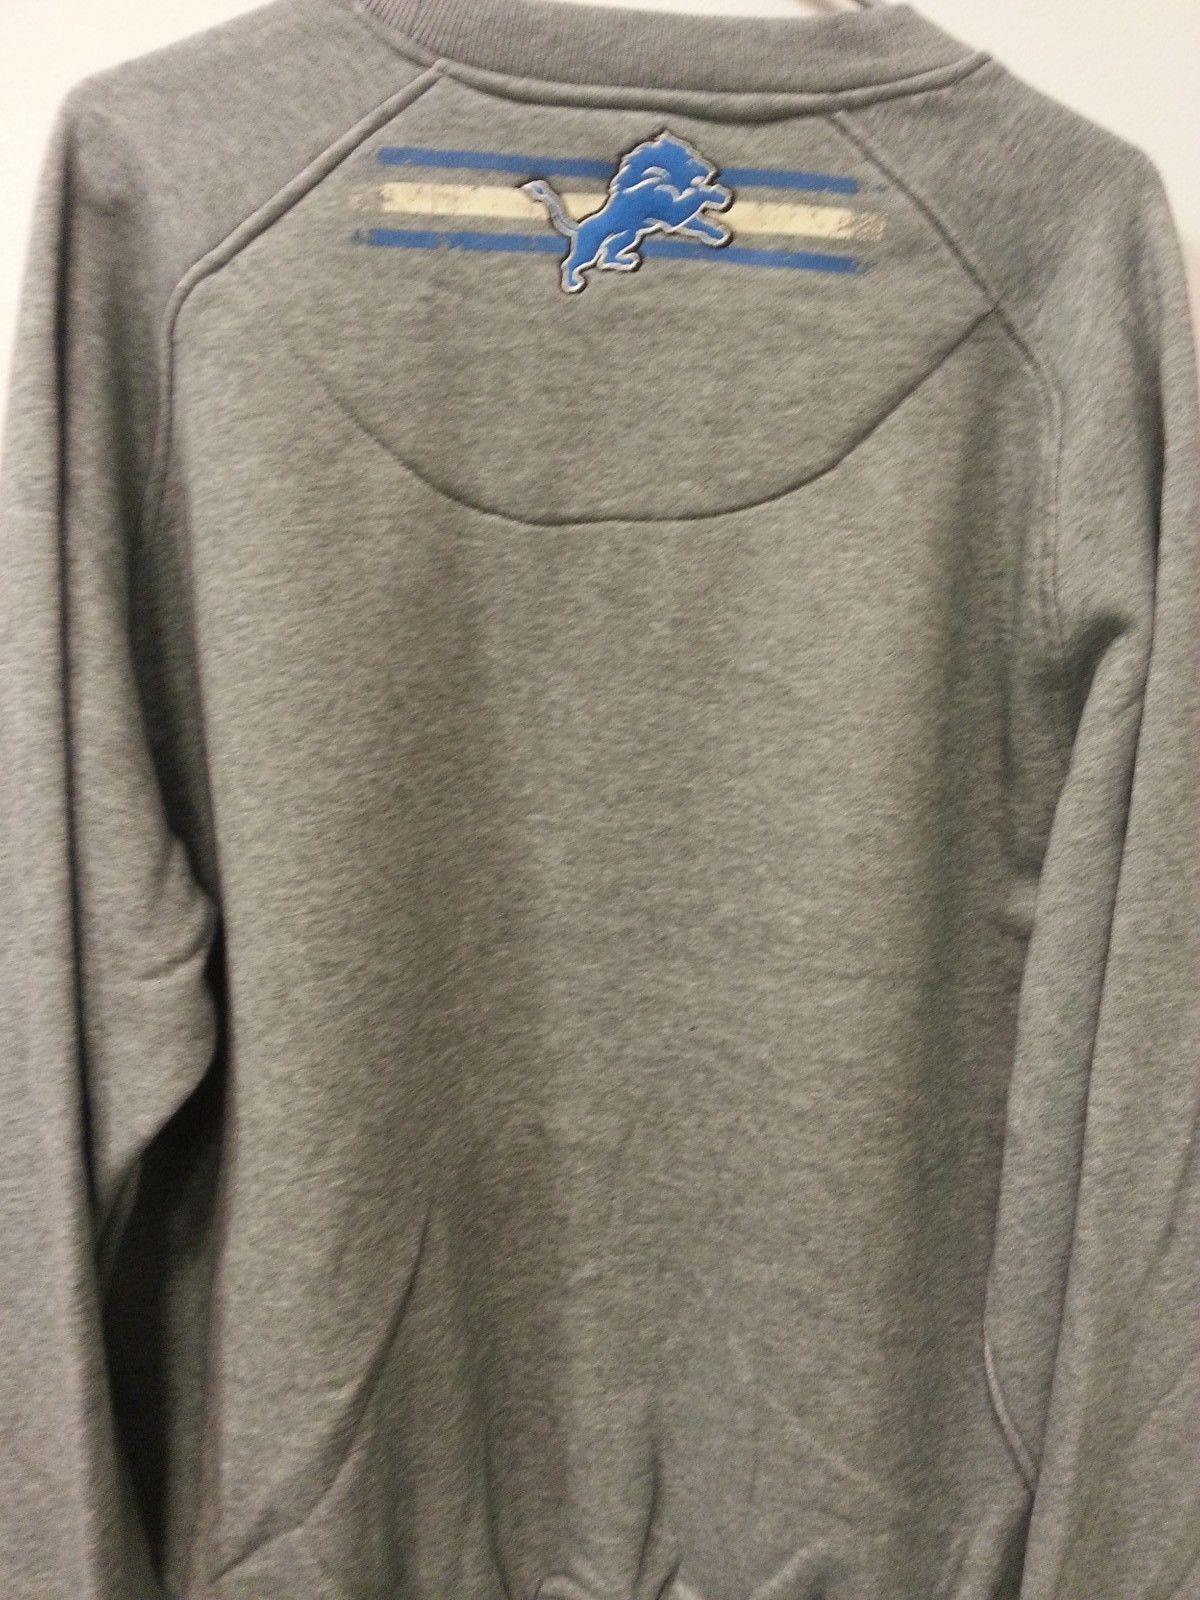 Brand NEW DETROIT LIONS Crew Neck Crewneck 'BIG TIME' sweatshirt AUTHENTIC